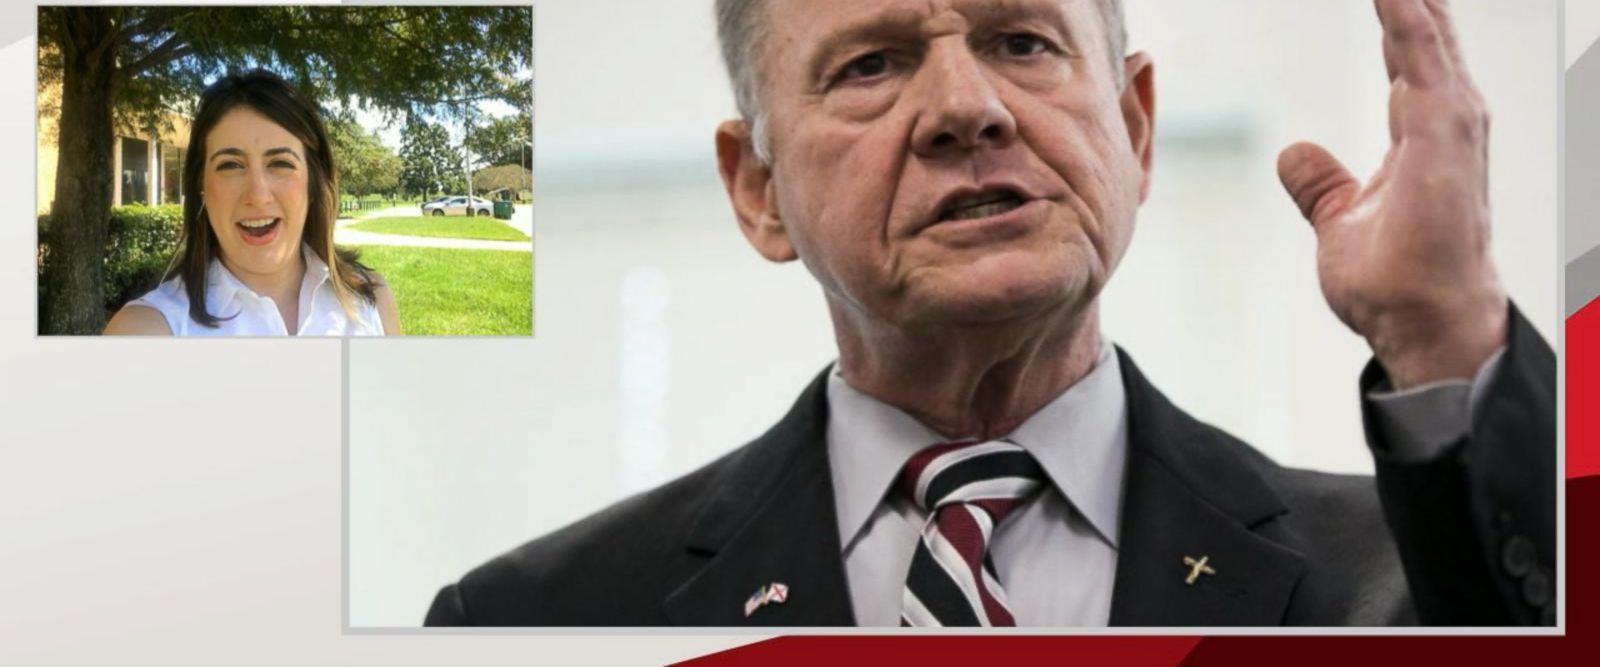 VIDEO: Alabama Senate primary runoff a proxy war for Trump and Bannon